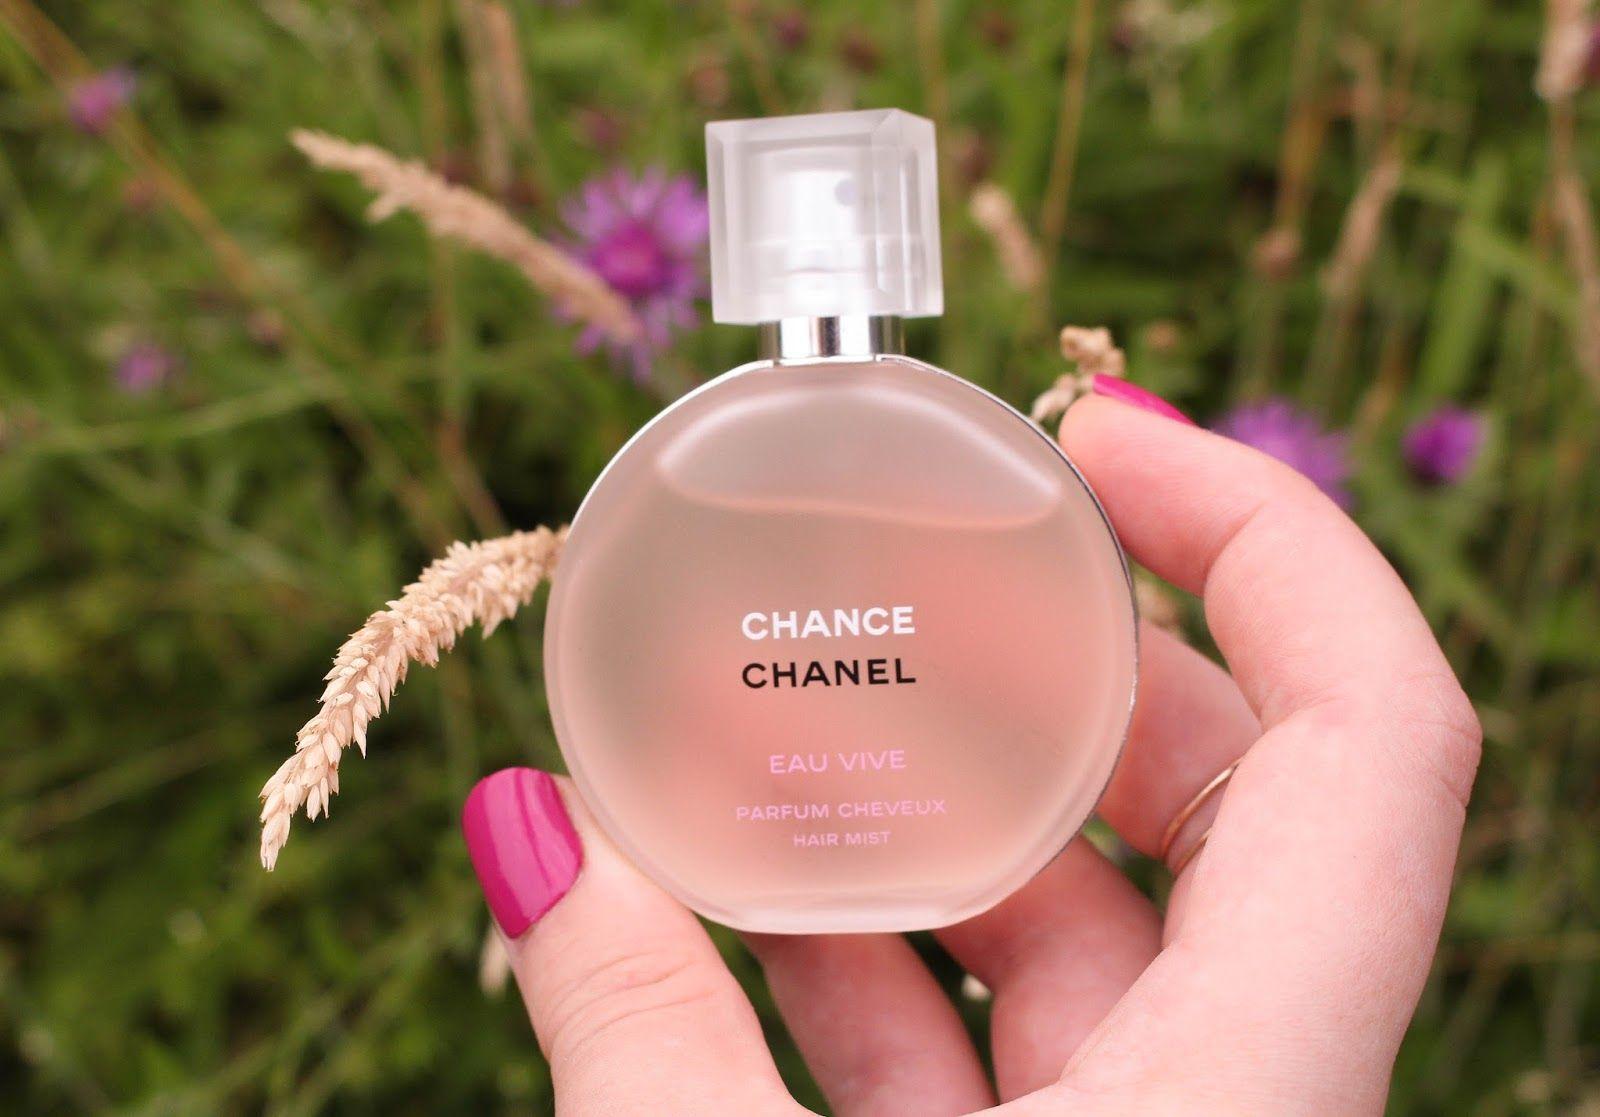 Chanel Chance Eau Vive Hair Mist Review Chanelcosmetics